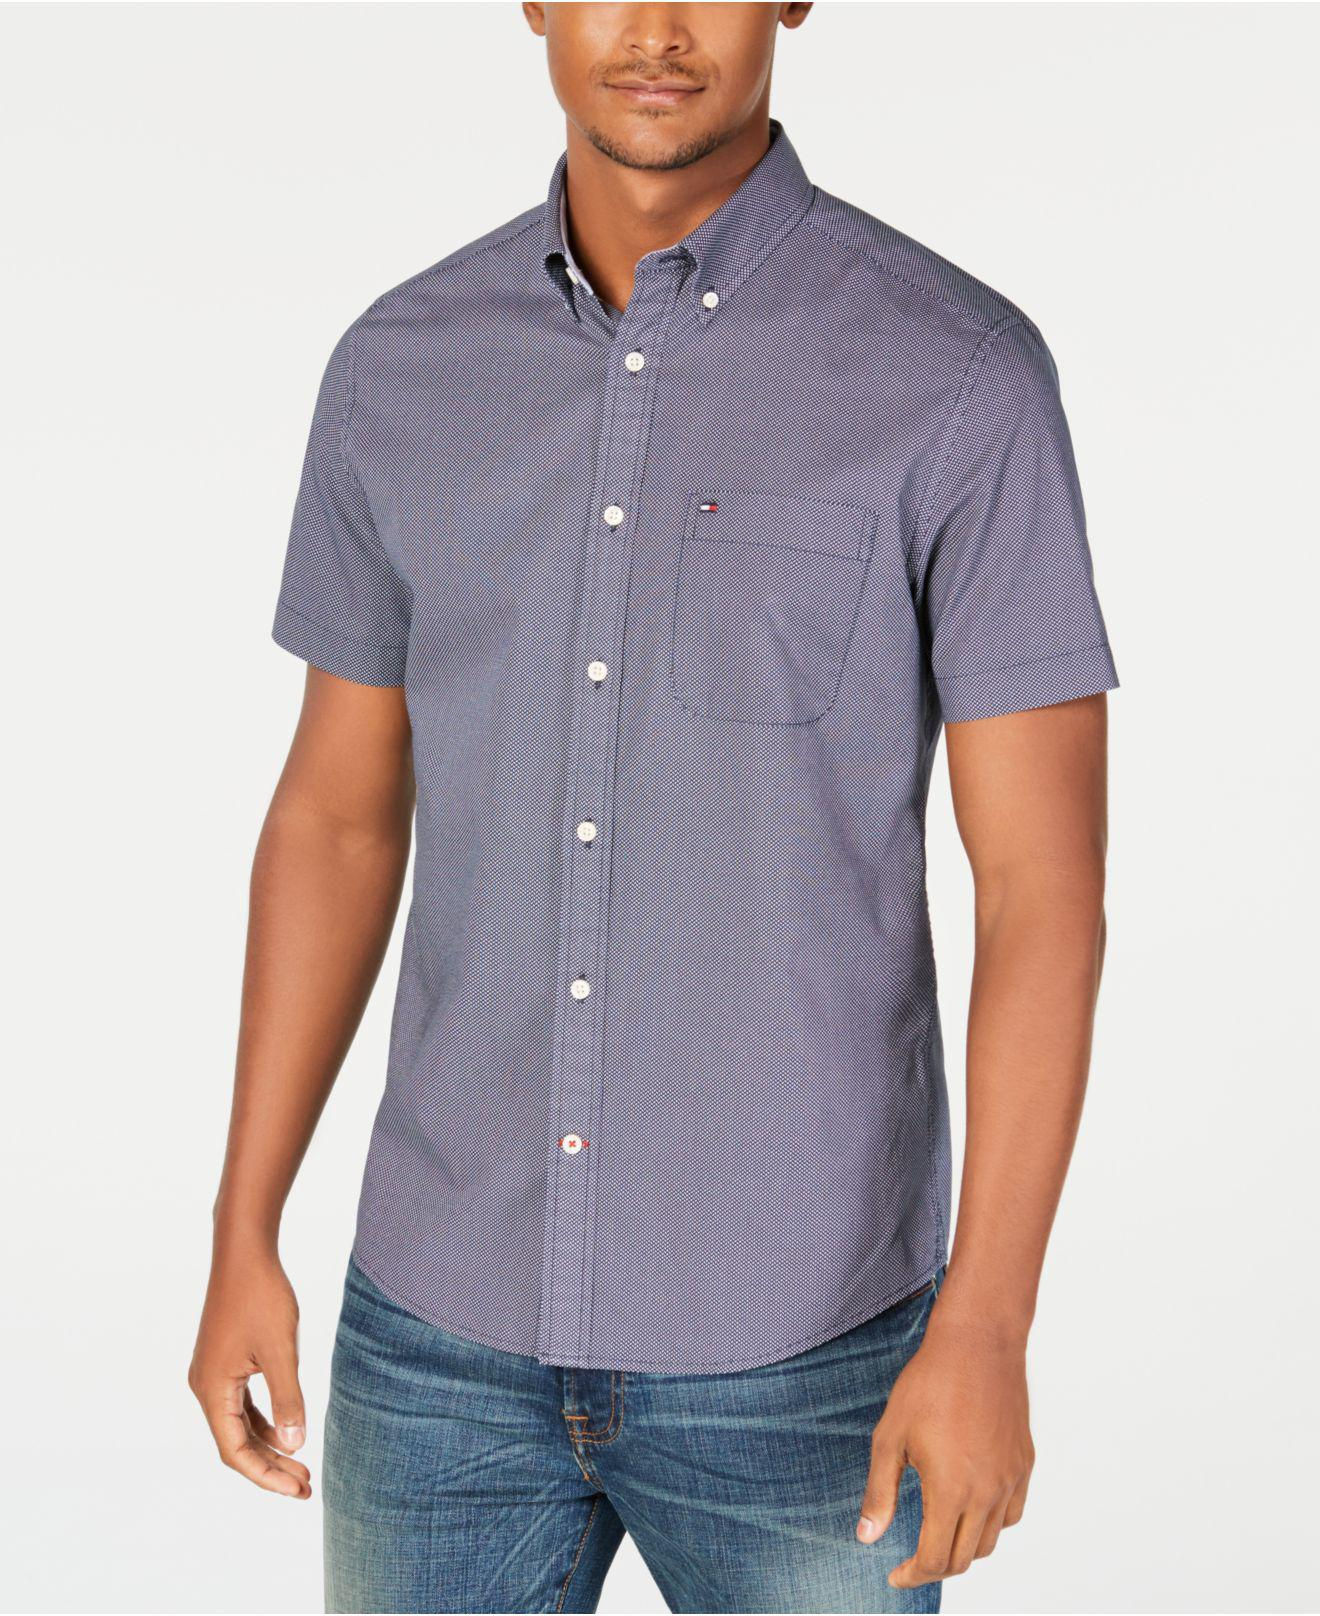 9e690b87 Lyst - Tommy Hilfiger Lucien Custom-fit Piece-dyed Print Shirt ...